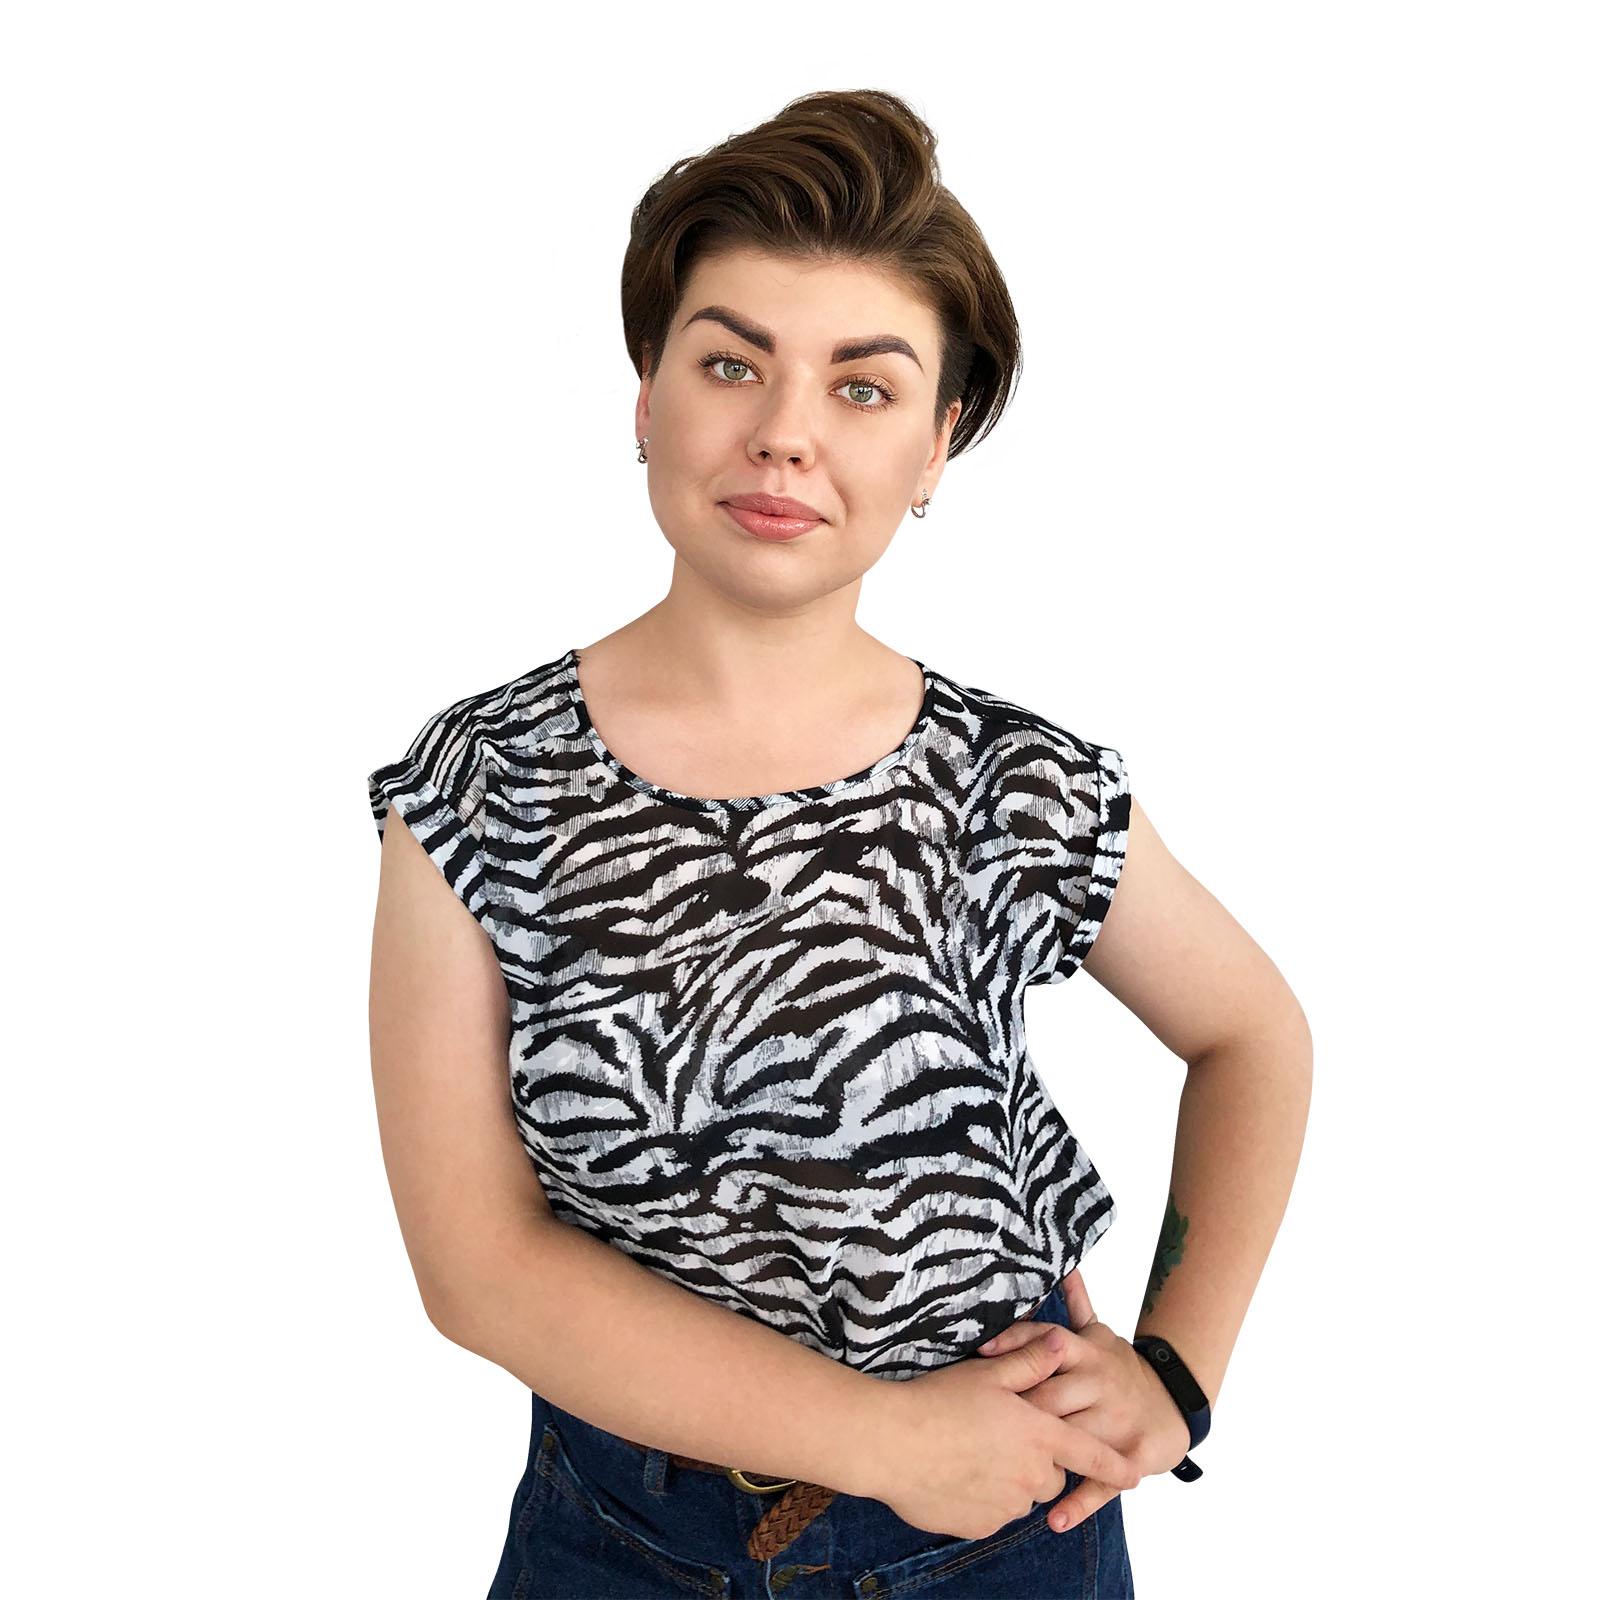 Інна Старкова